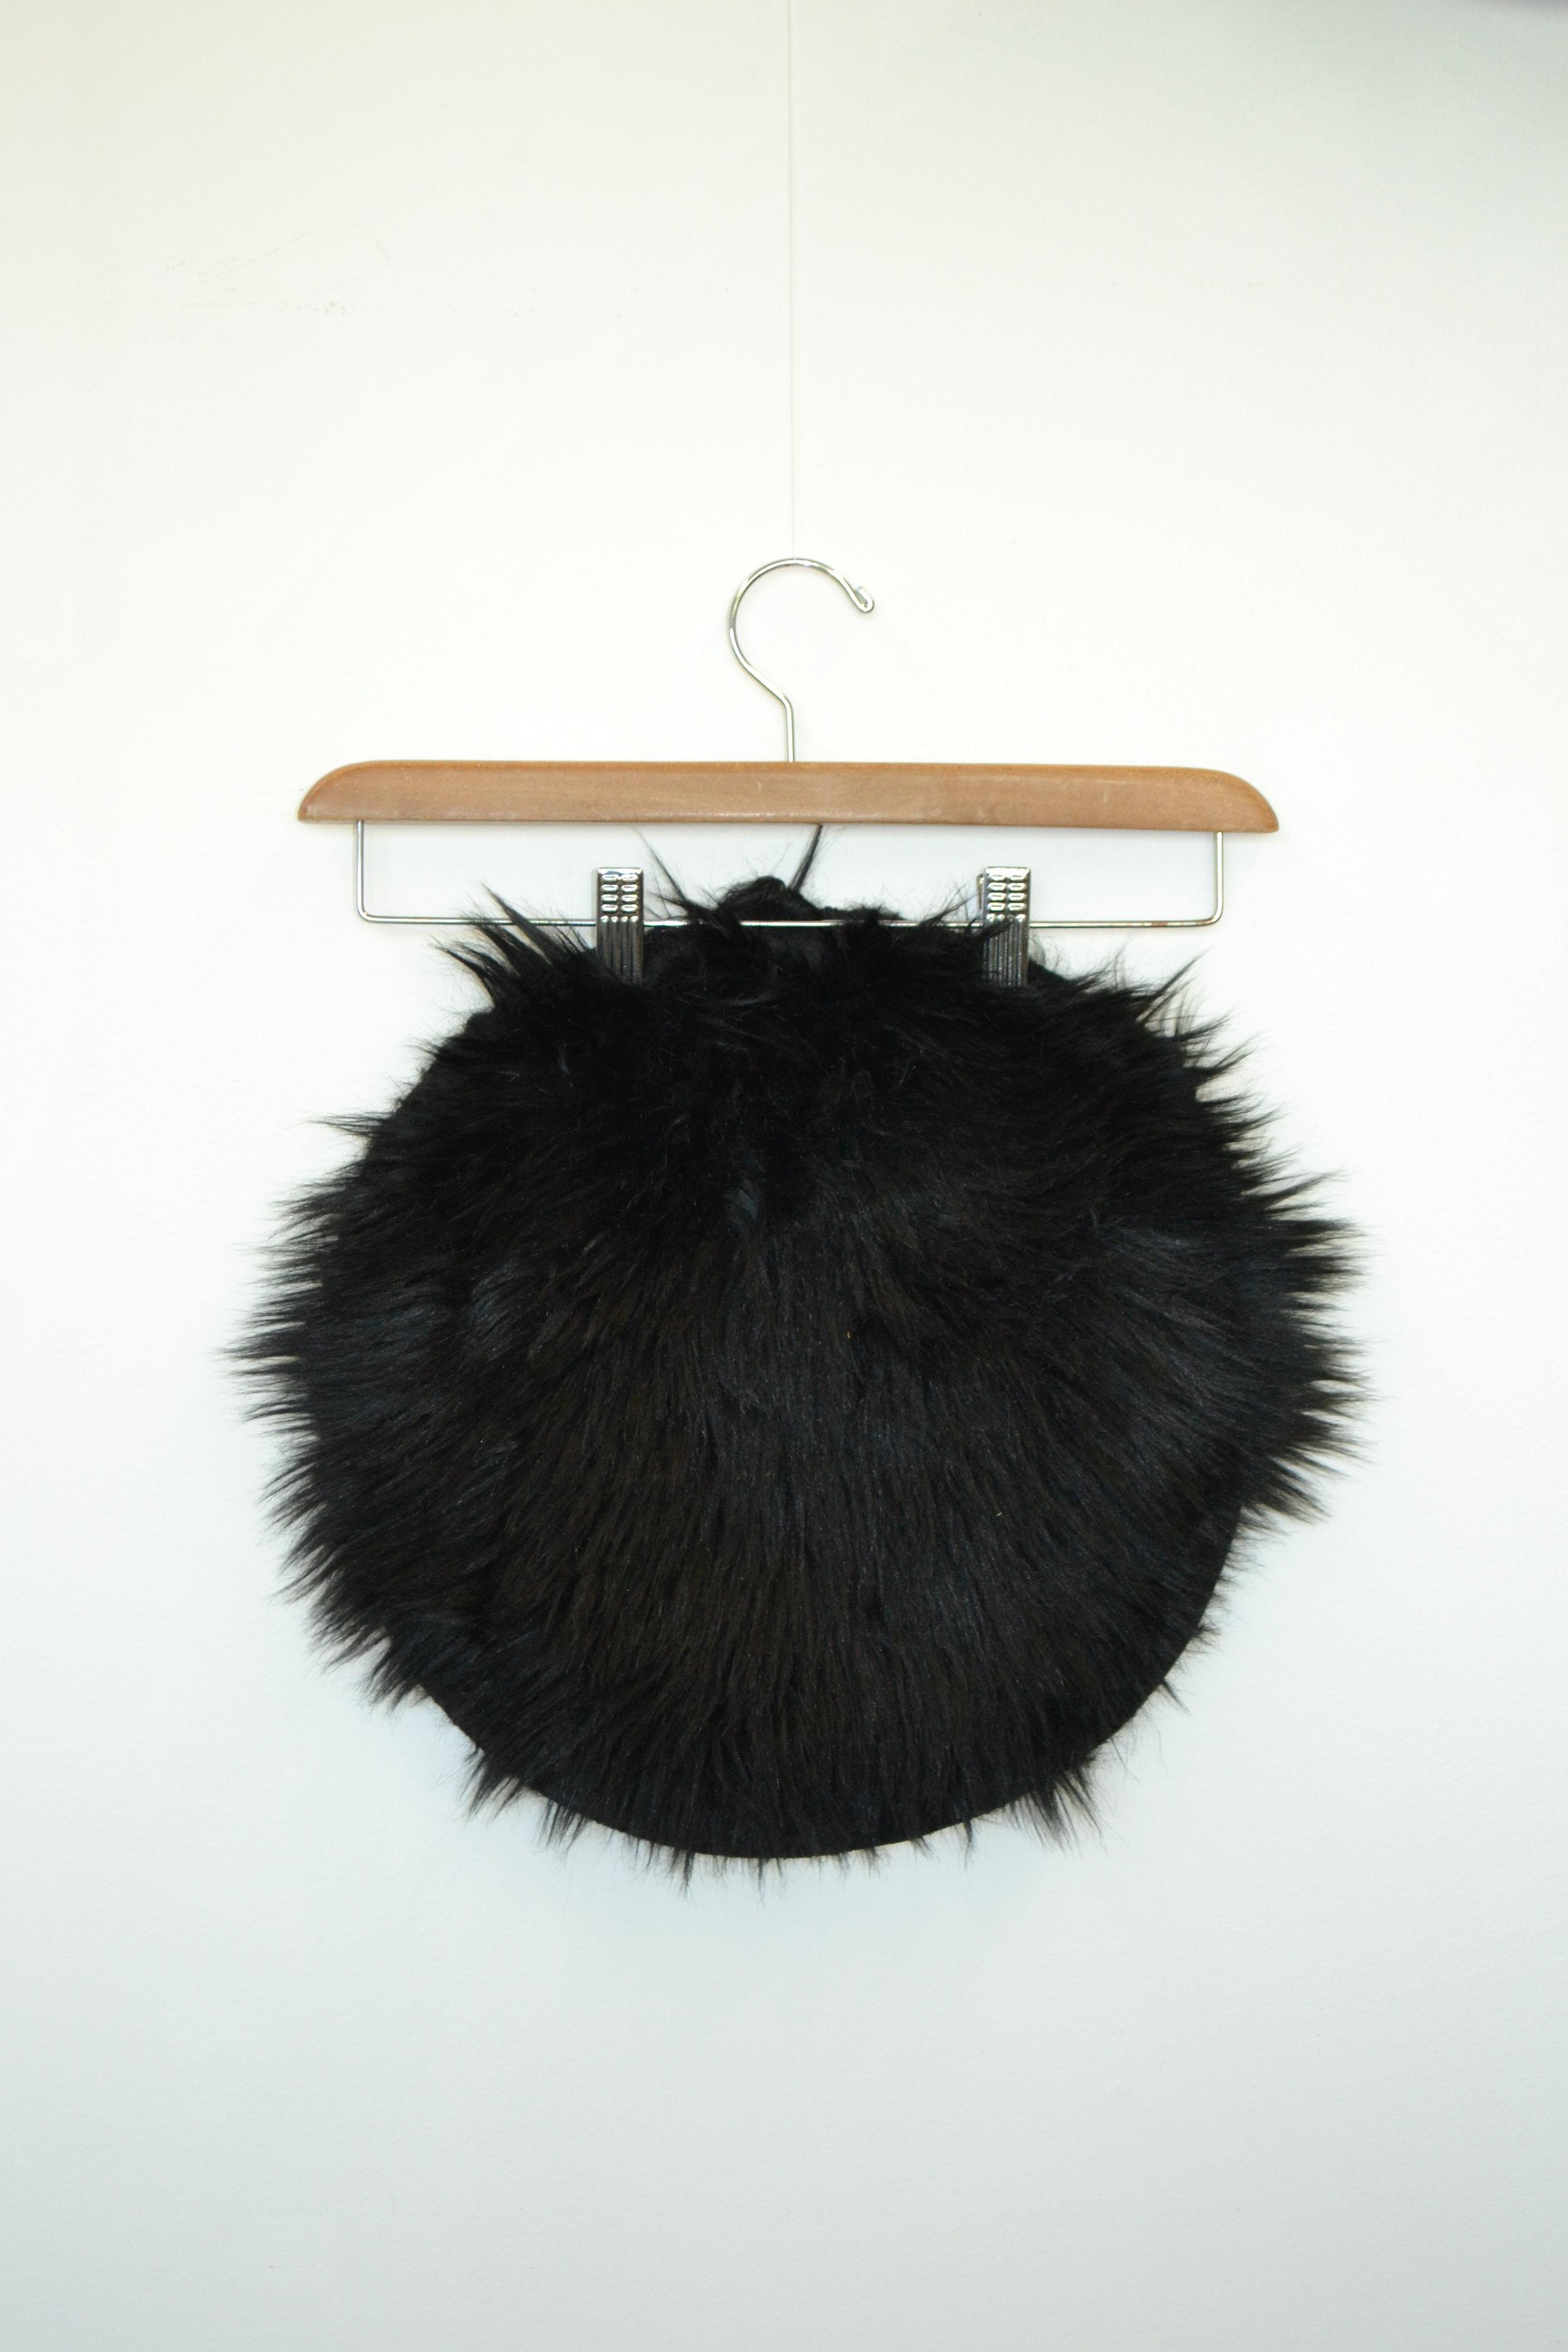 faux-fur stool cover - black   Quantity: 1  Price: $3.50